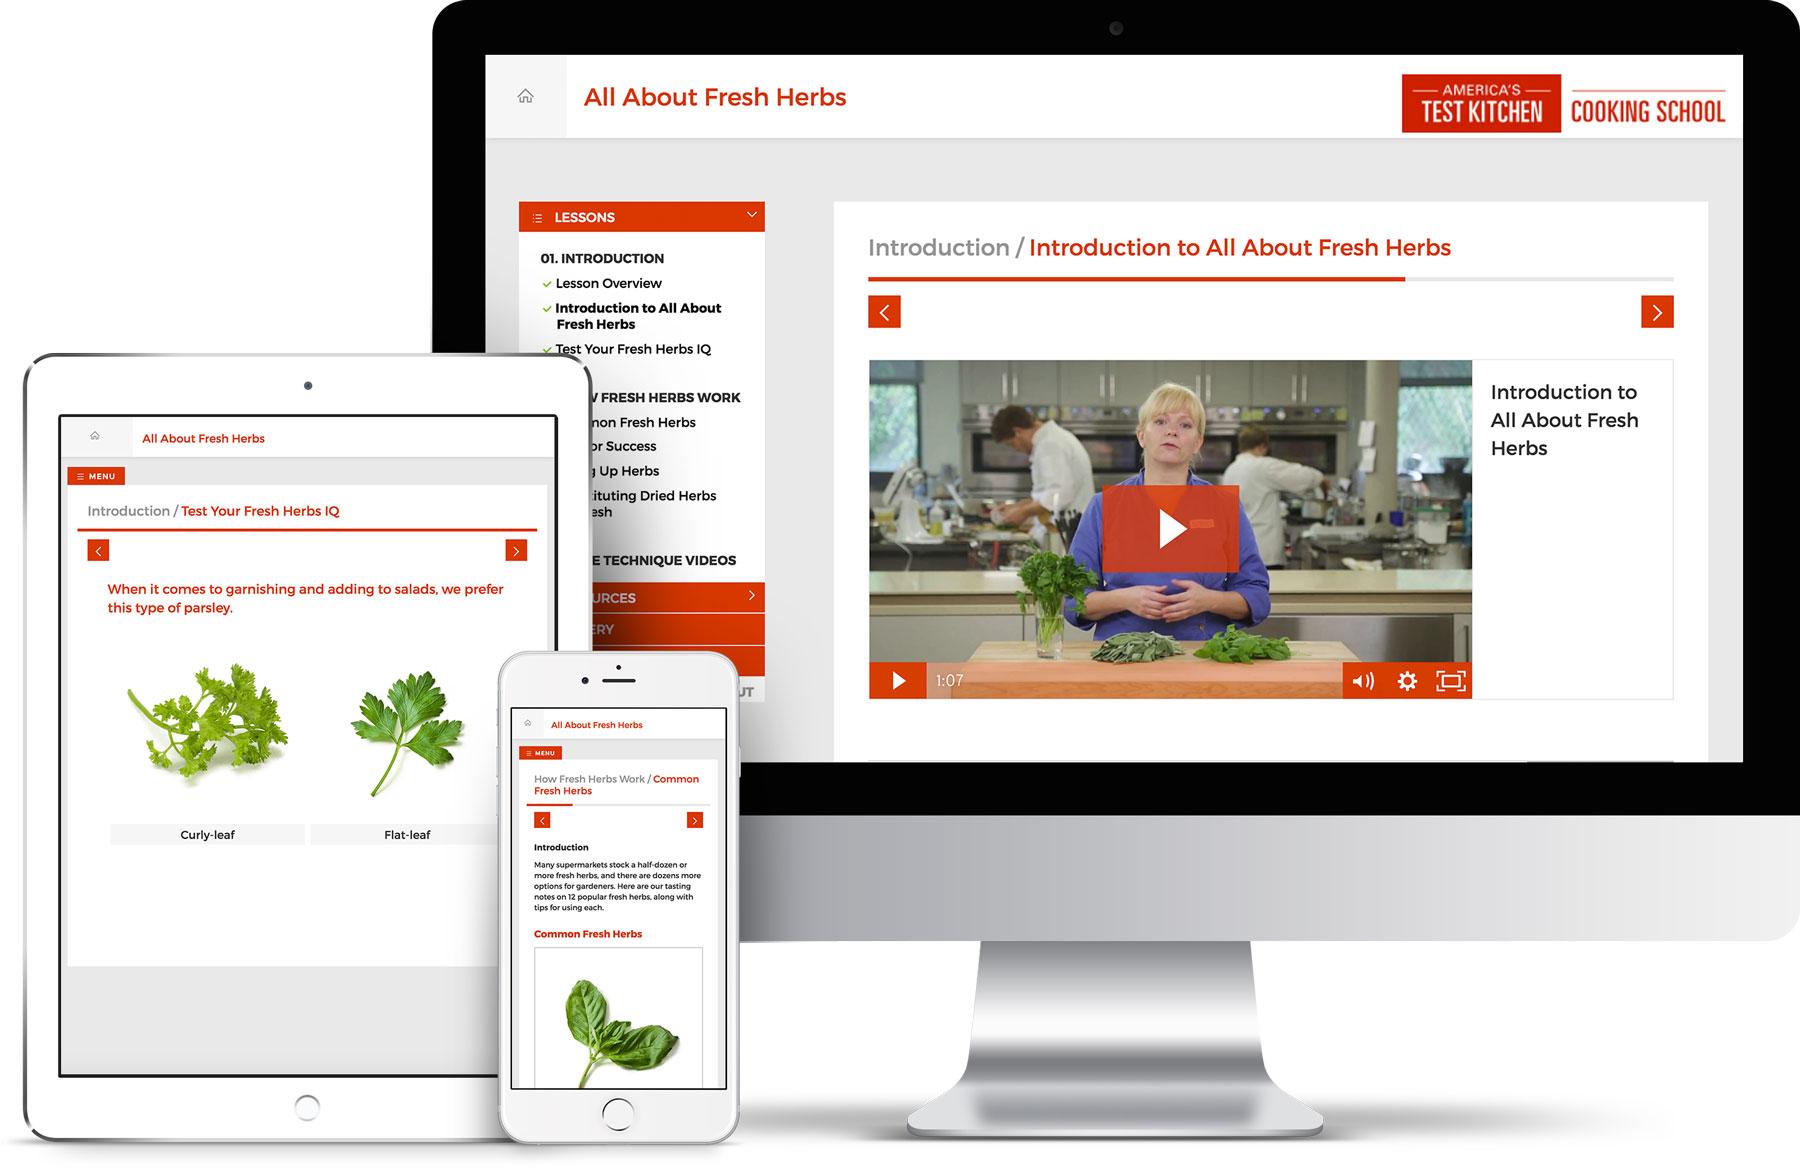 America\'s Test Kitchen Online Cooking School